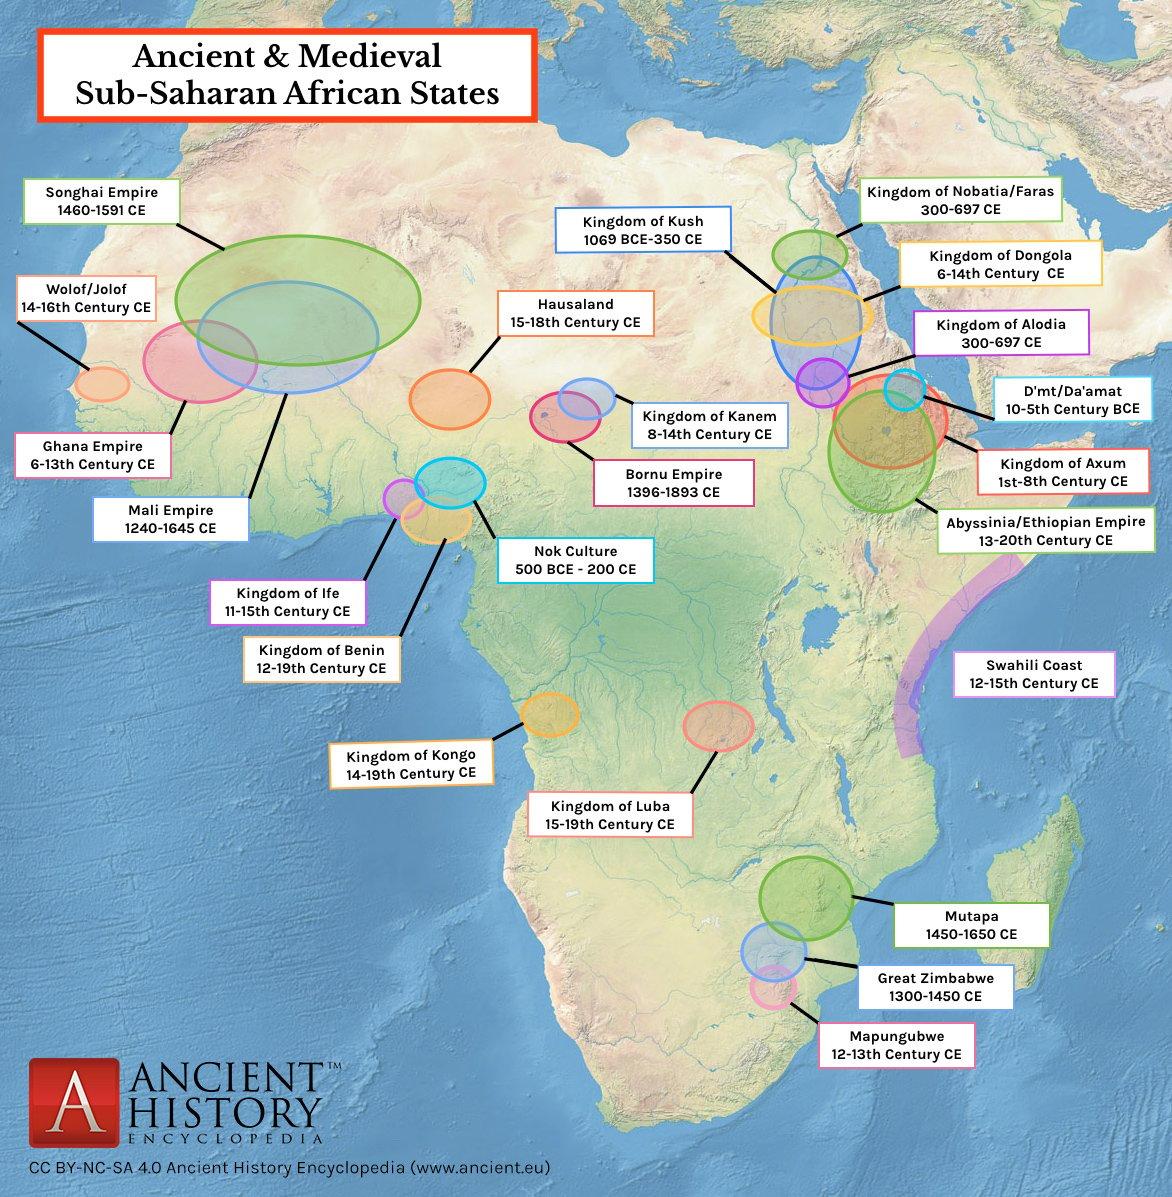 Map of Ancient & Meval Sub-Saharan African States ... Map Of Africa States on map of the east coast states, map of western region states, map of benelux states, map of australia states, map of west region states, map of north usa states, map of america's states, map of states civil war, map italy states, map of western u.s. states, map of israel states, map of southeastern usa states, map of connecticut states, map of former soviet union states, map of middle east states, map of cambodia states, map of world states, map of u.s.a states, map of indochina states, map malaysia states,